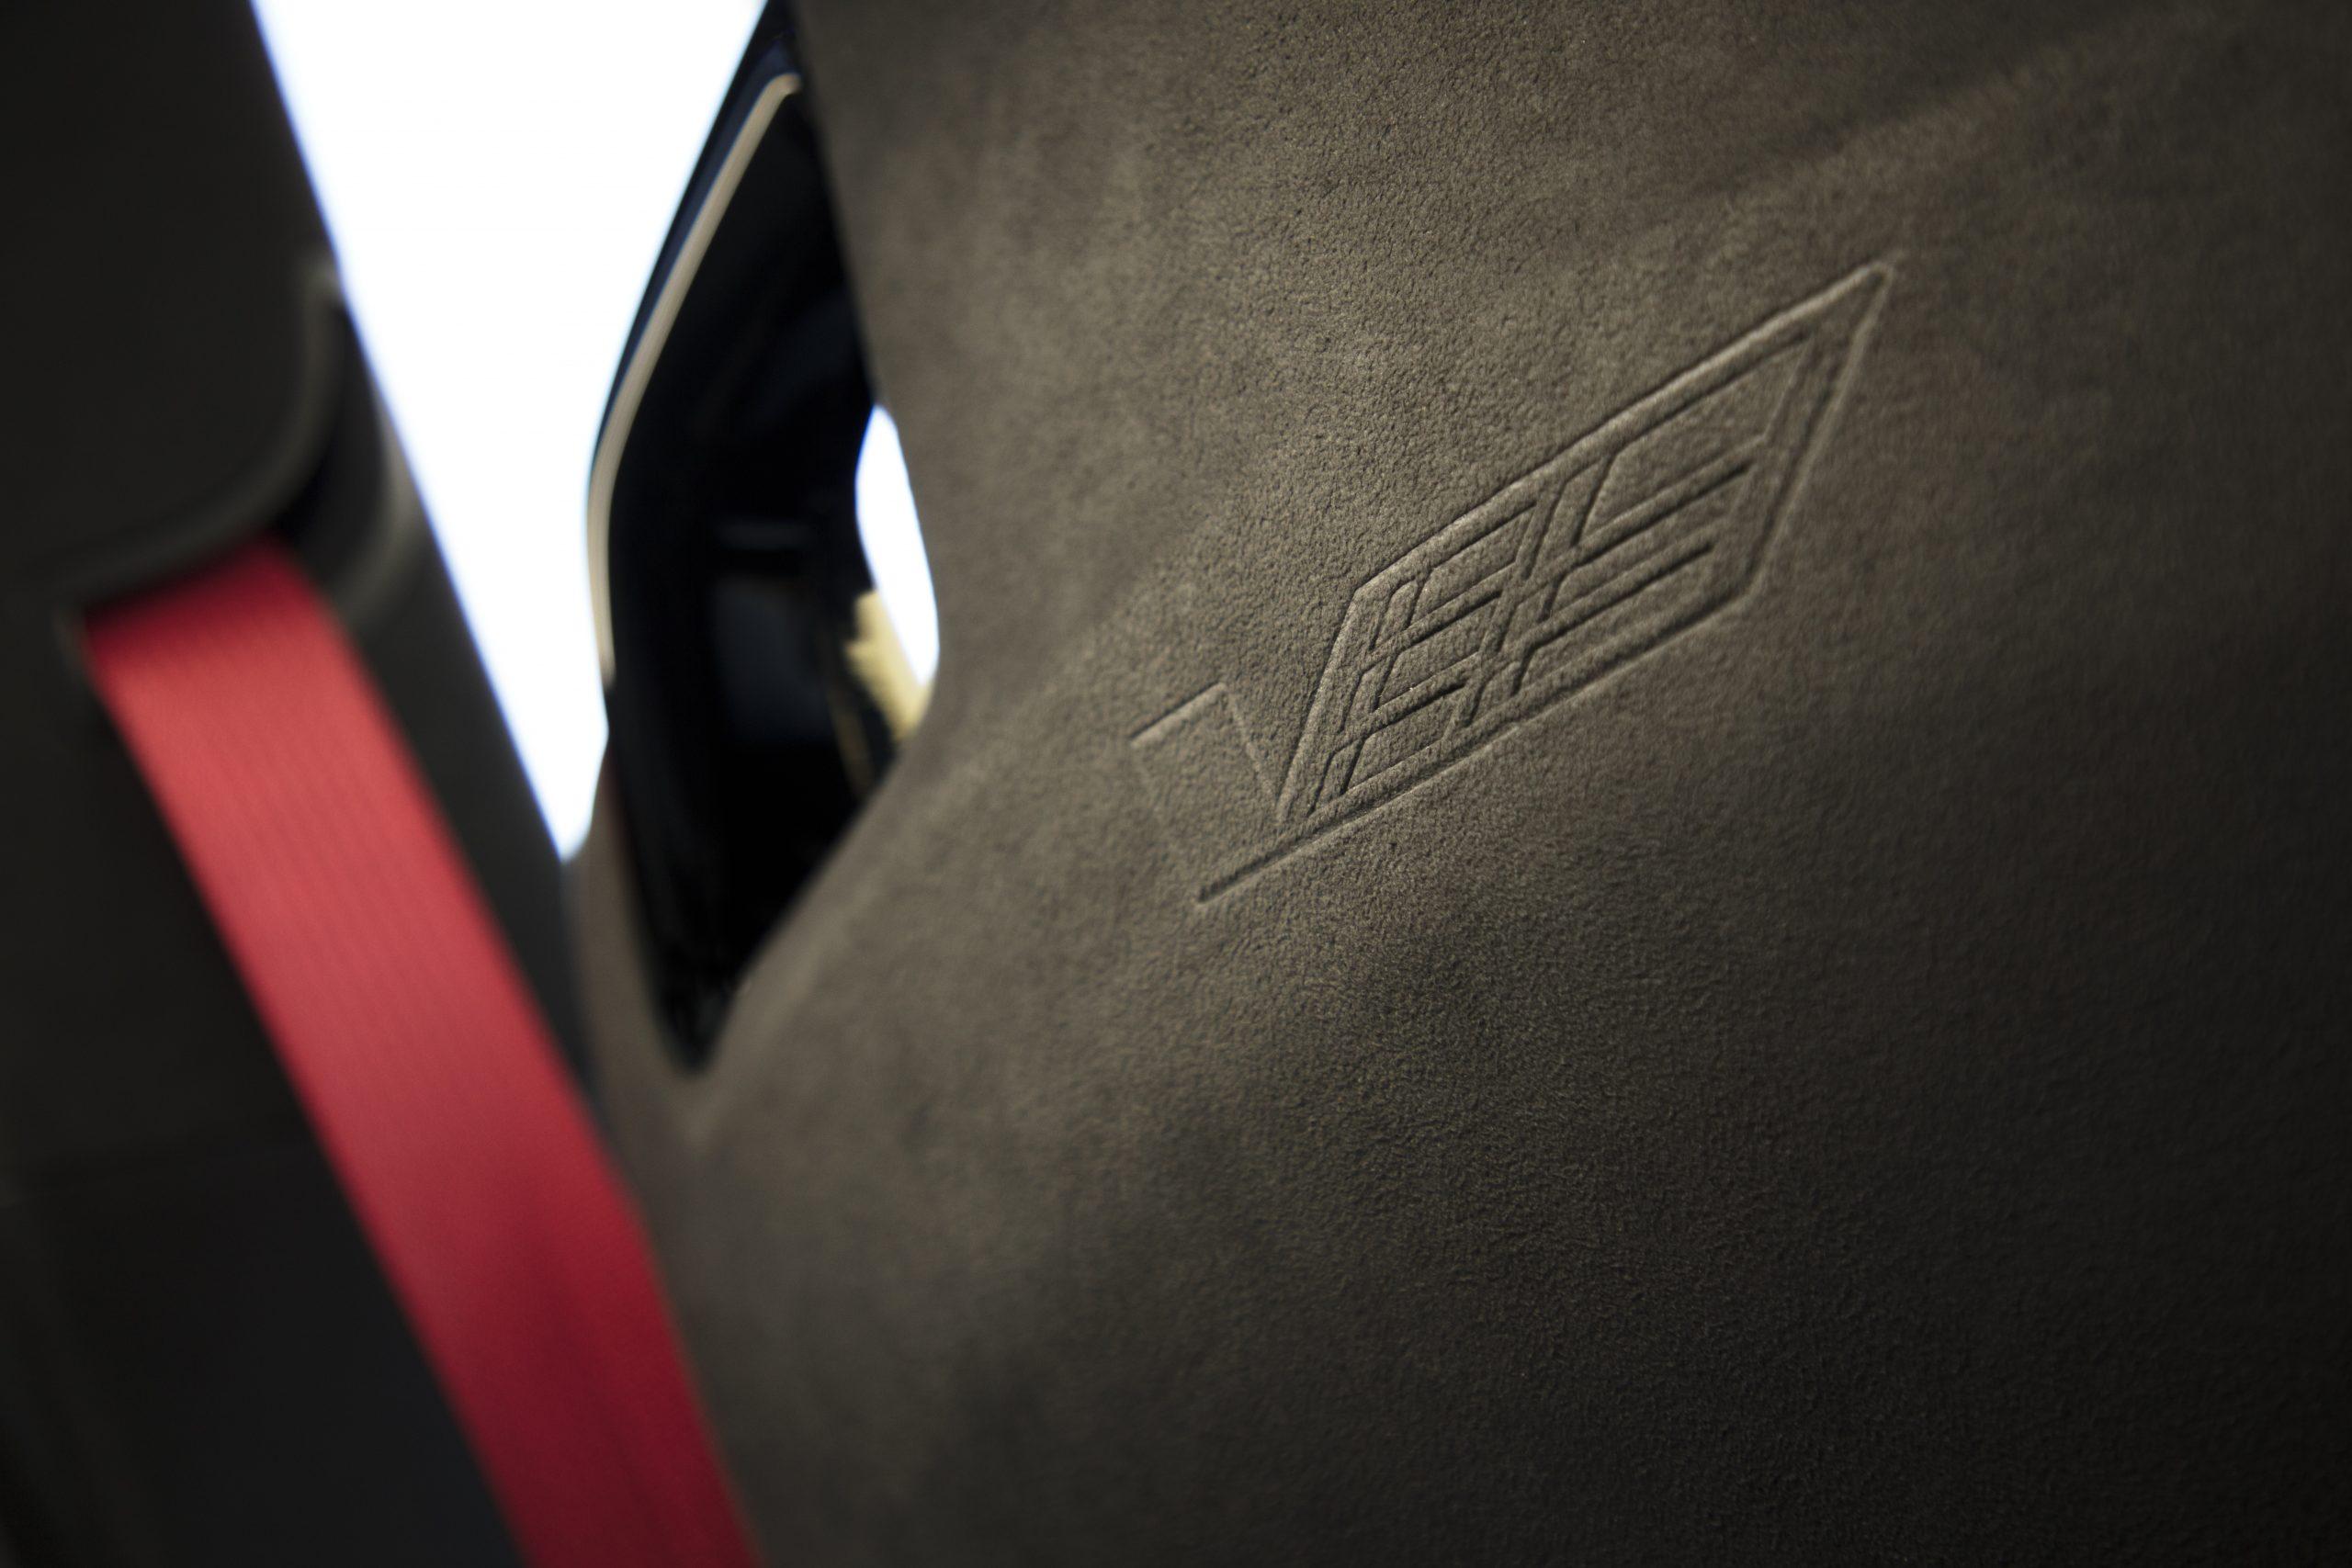 2022 Cadillac CT4-V Blackwing seat back